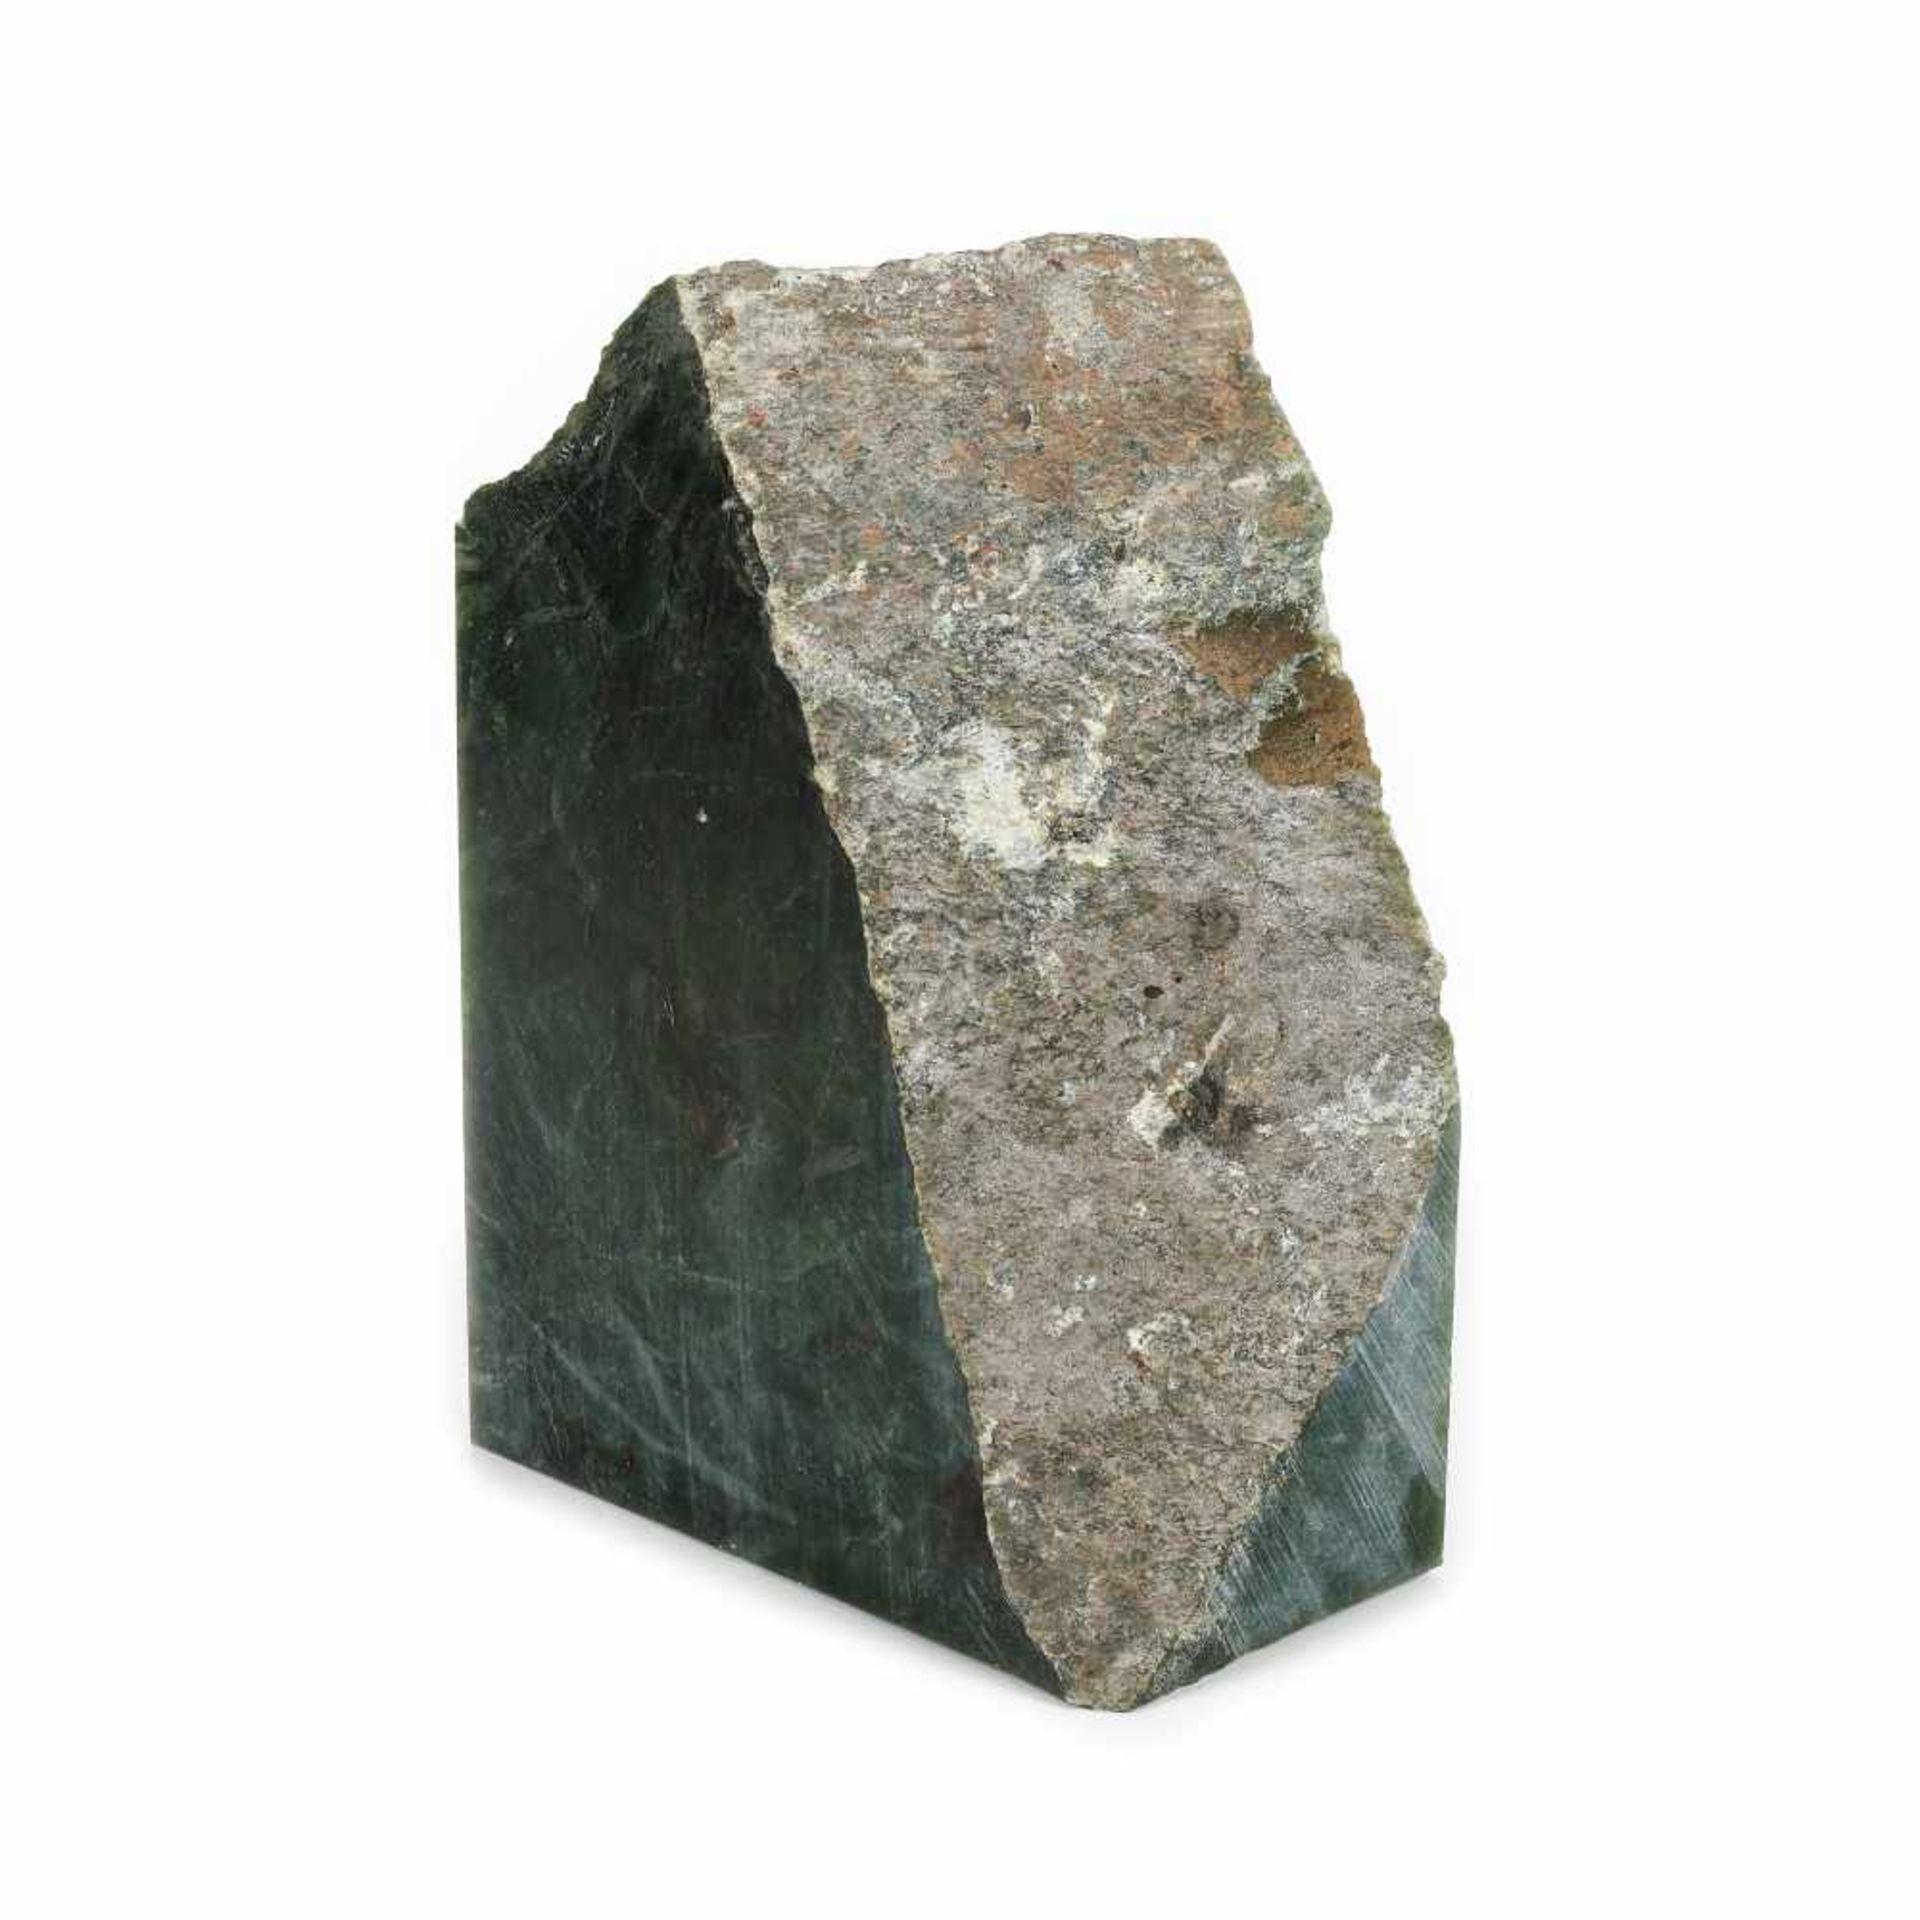 Unprocessed nephrite (jade) fragment